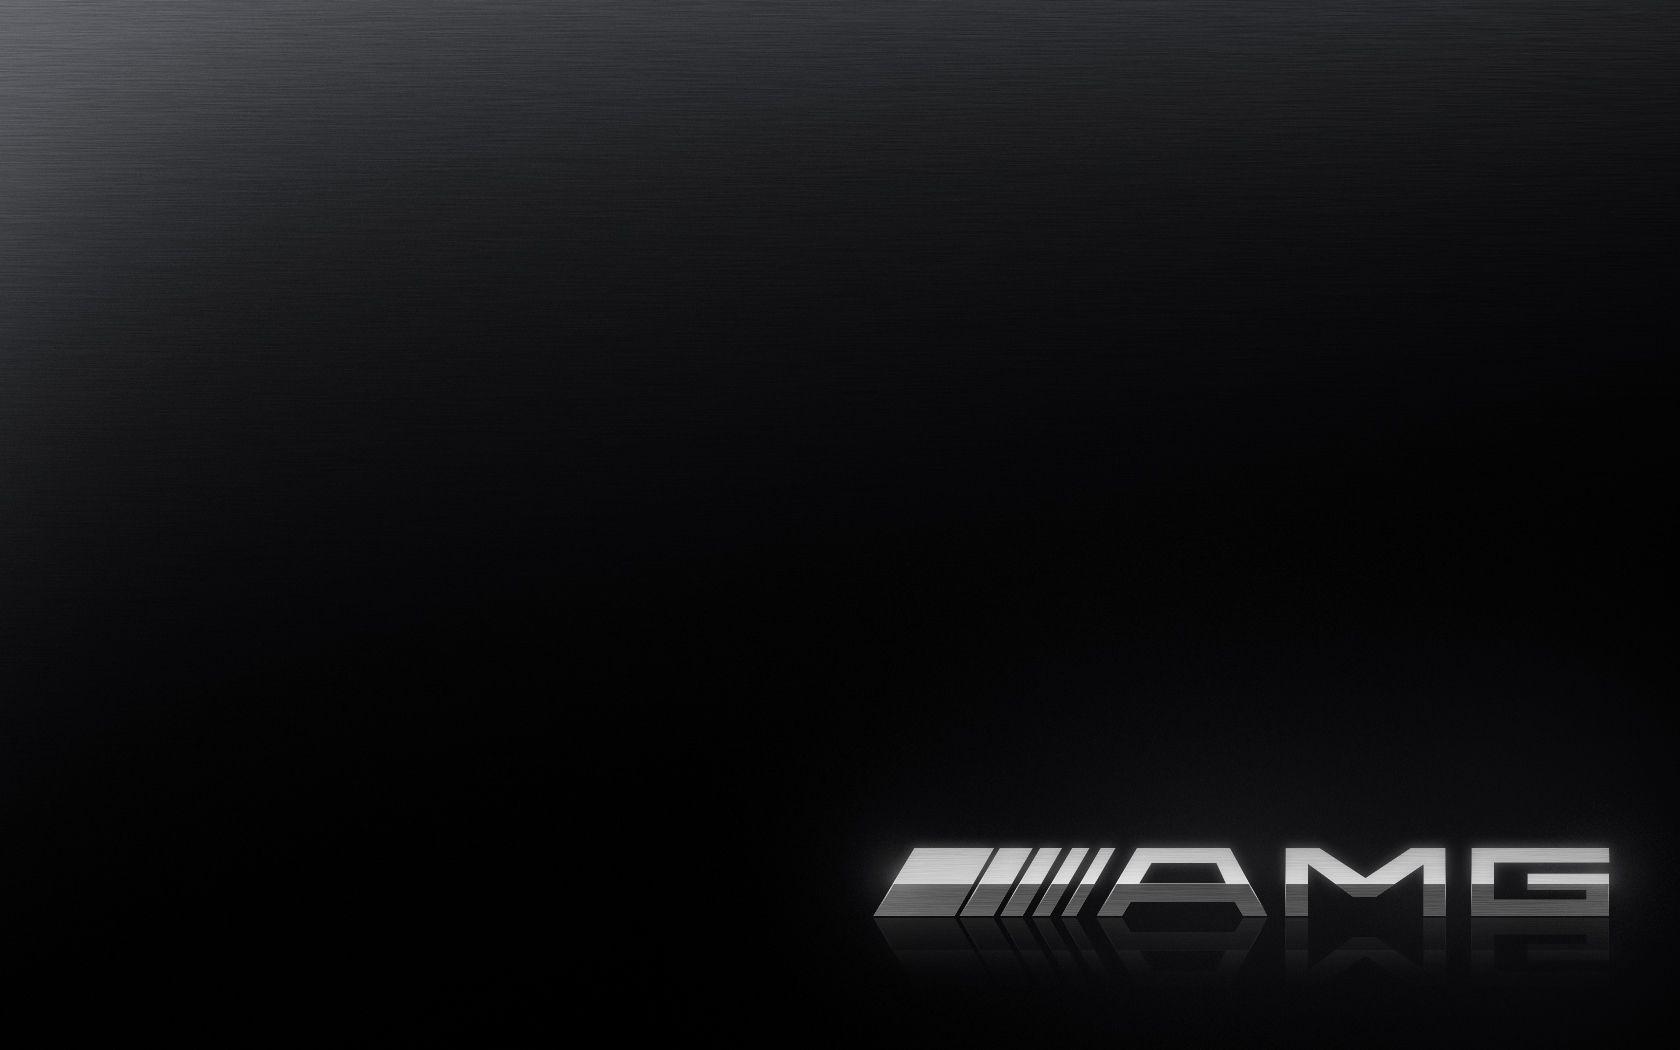 Mercedes Logo Wallpaper Mobile With Images Amg Logo Mercedes